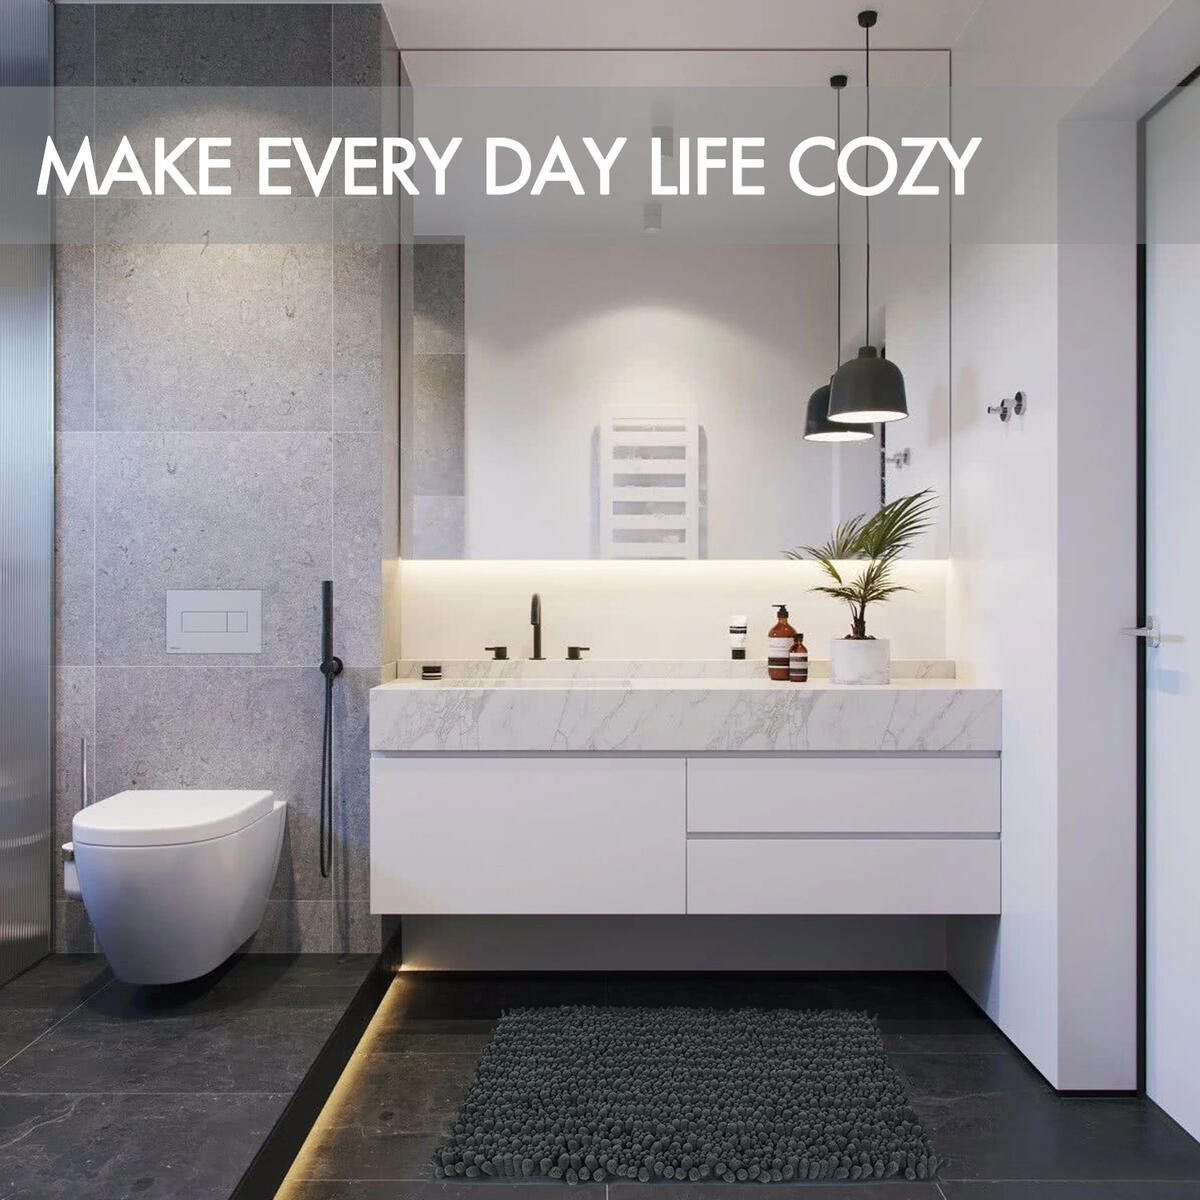 JTdiffer Bath Rugs Non Slip Super Absorbent Chenille Bath Mat, Soft Bathroom Rug Carpet, Extra Shaggy for Tub, Shower, Bath Room, Bedroom, Kitchen, Sink (17x24, Dark Grey)